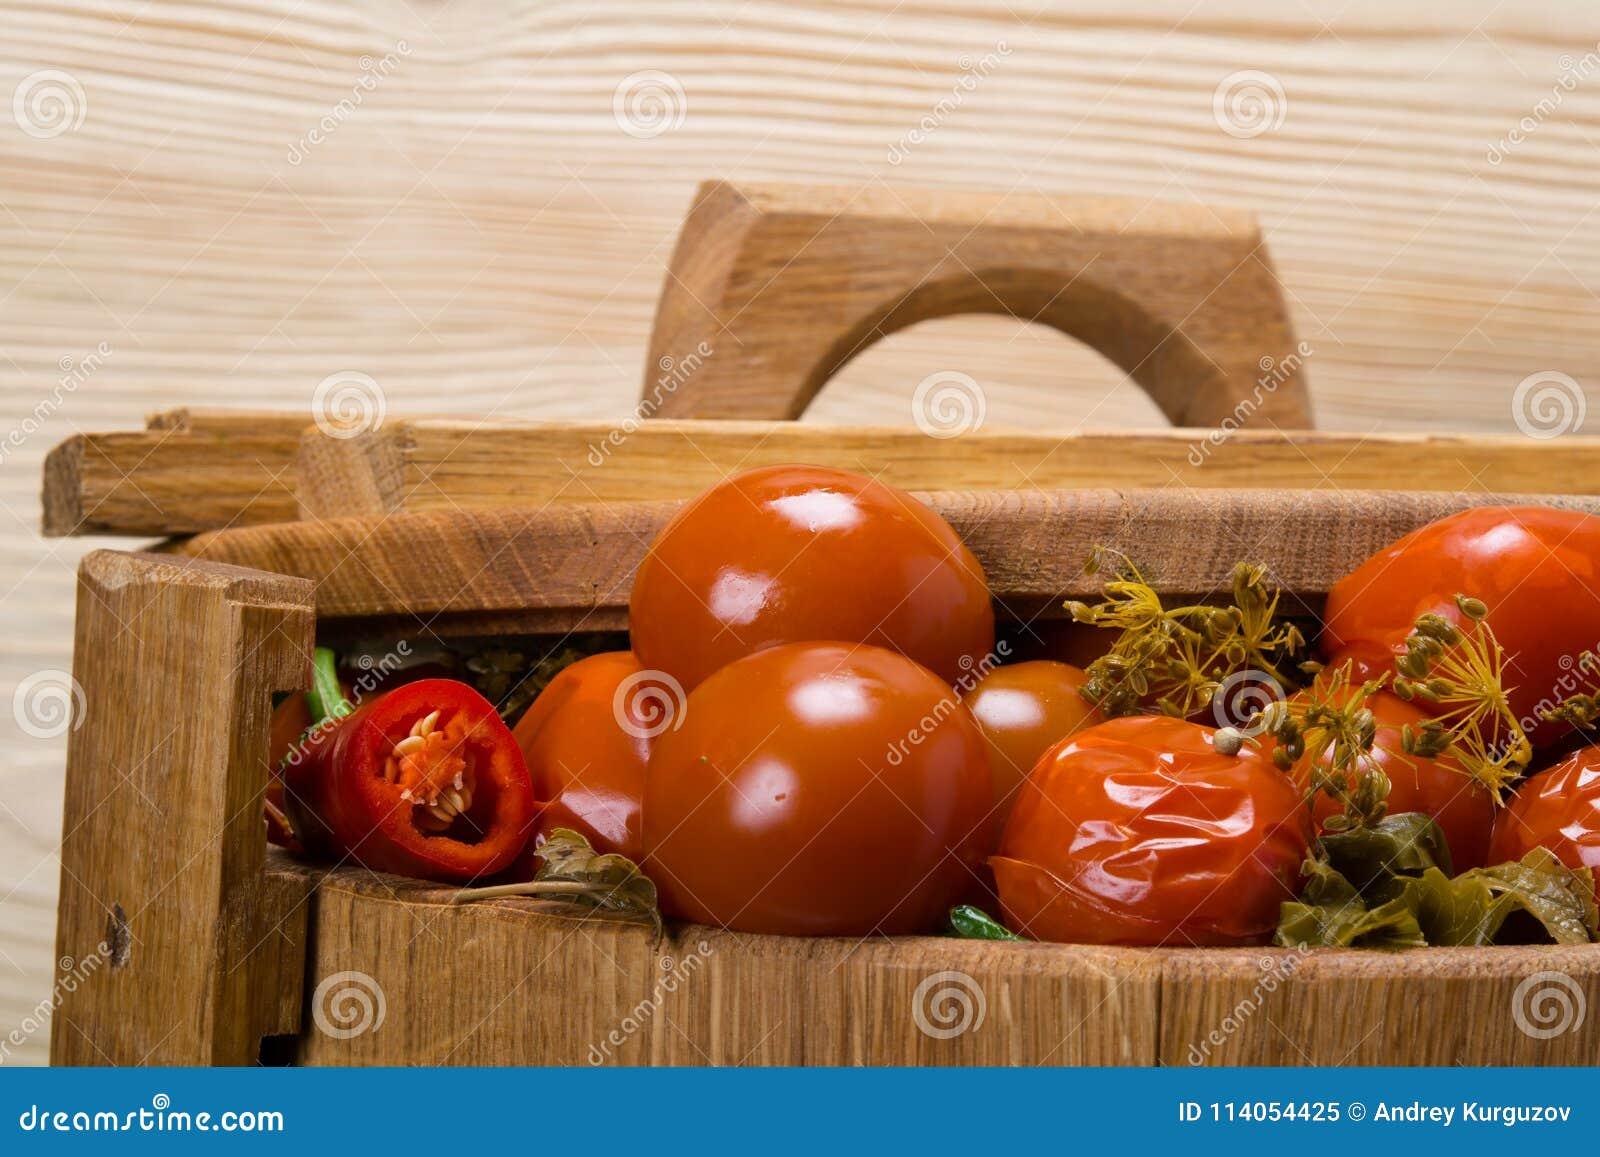 Green tomatoes. Blanks